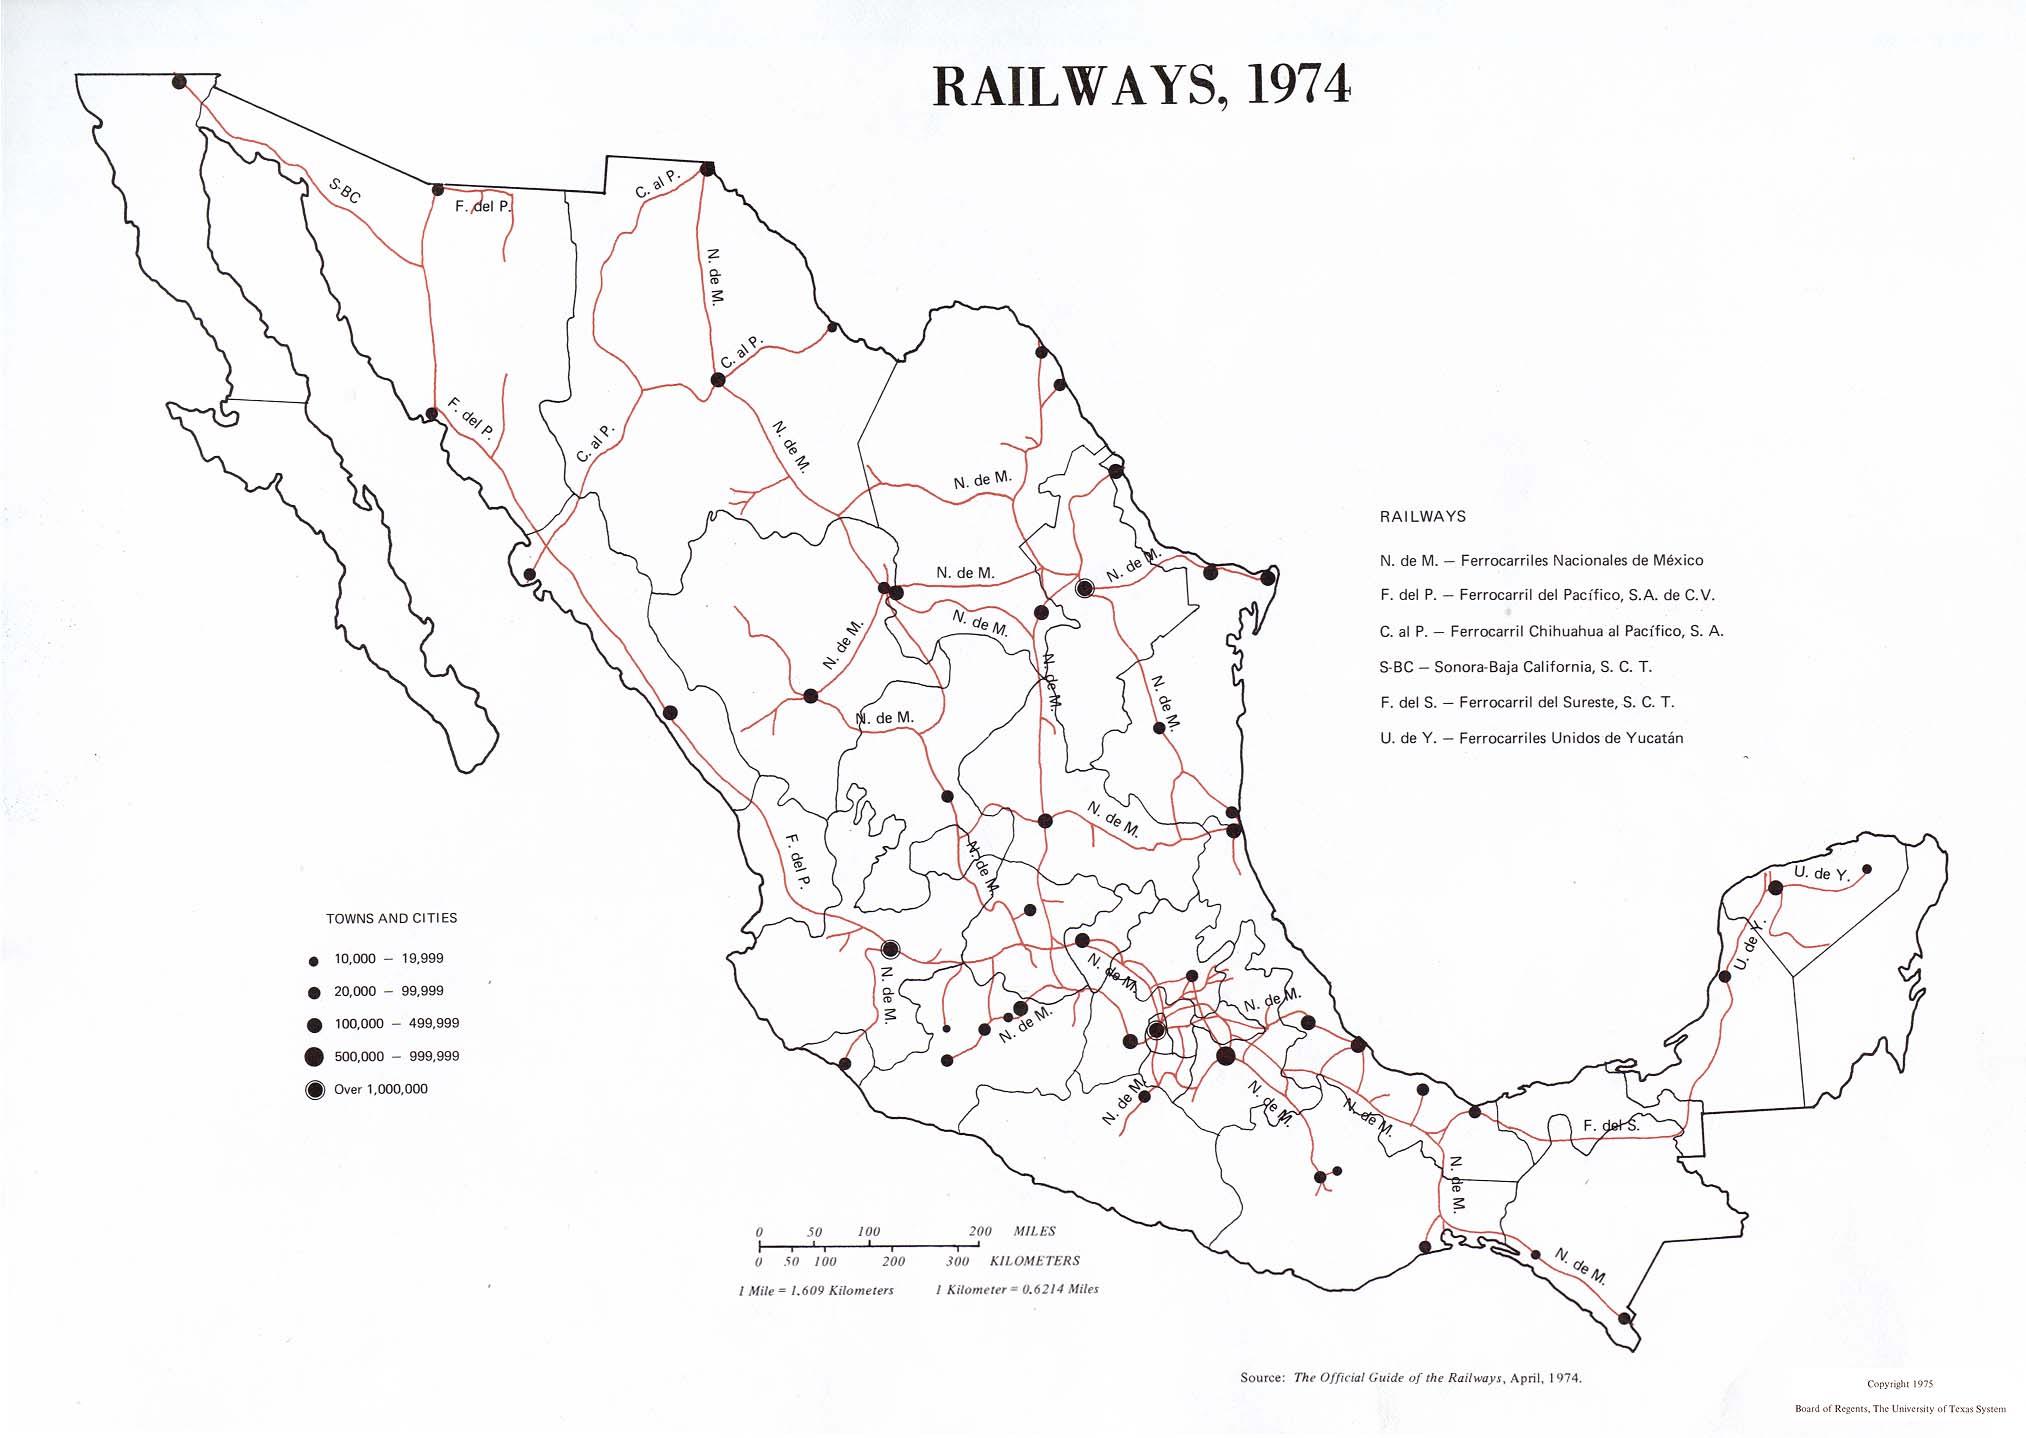 Mapa de Ferrocarriles de México 1974